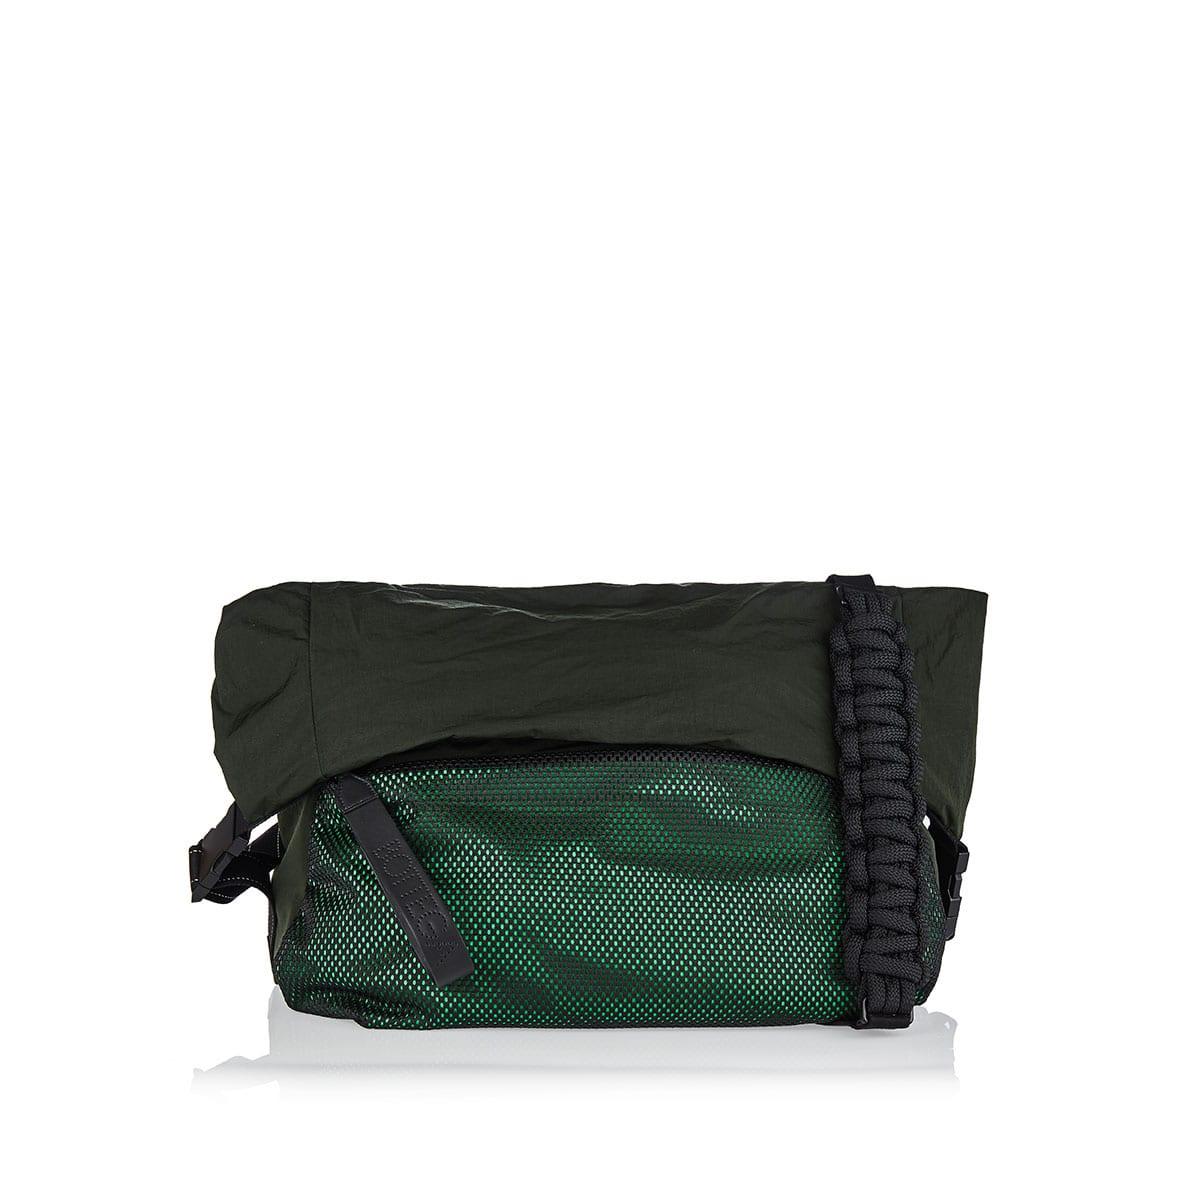 Large nylon messenger bag